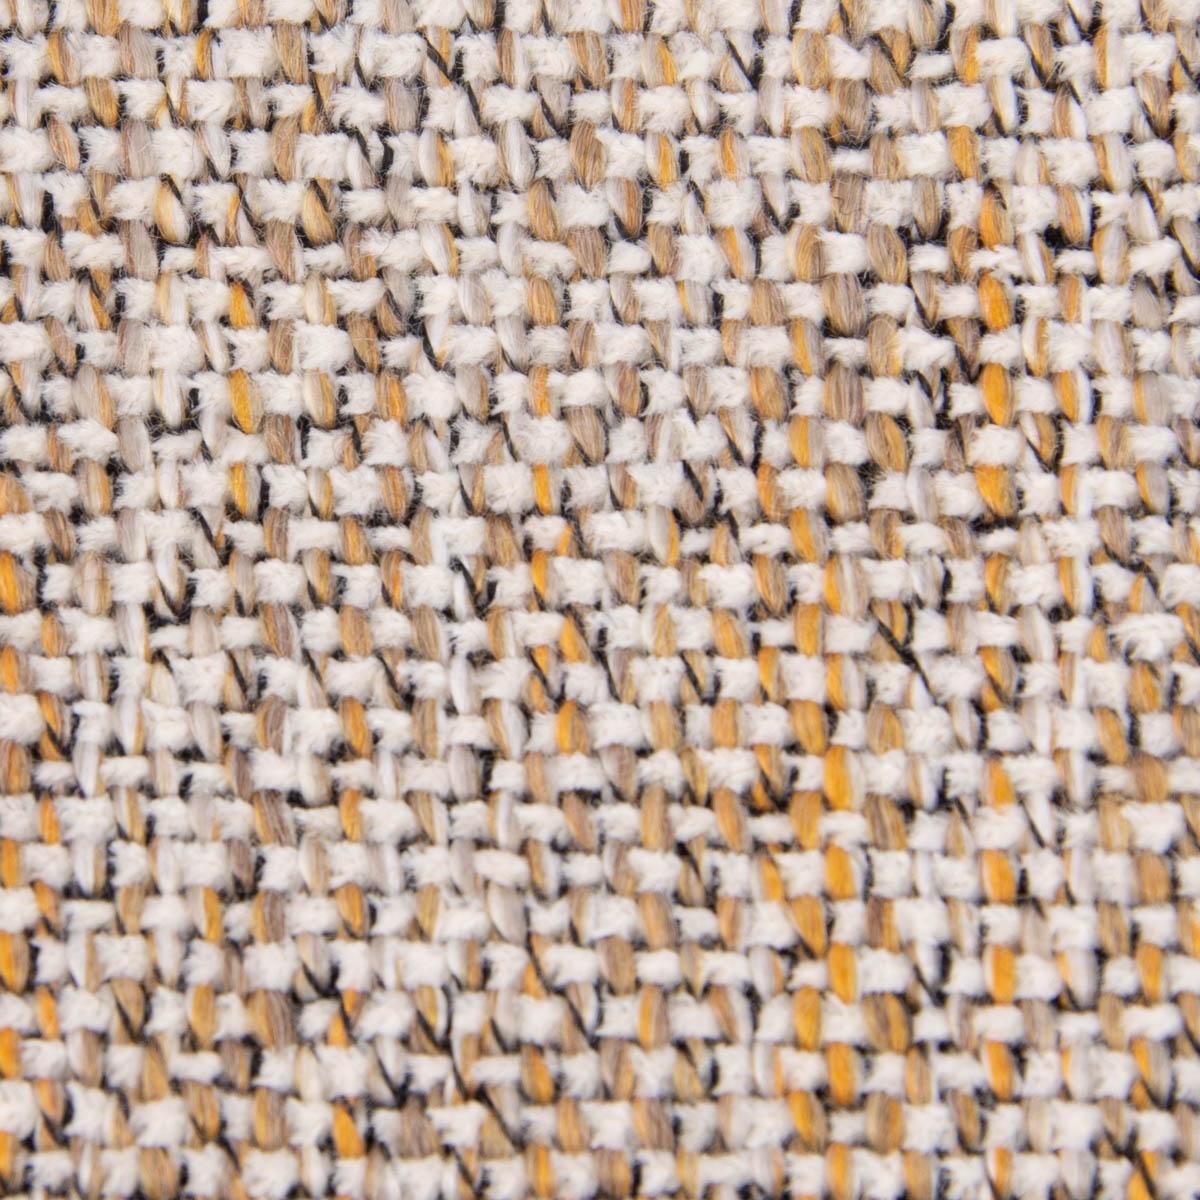 Polsterstoff Möbelstoff Bezugstoff Höpke Stoff Flachgewebe Grau Rankenmuster NEU